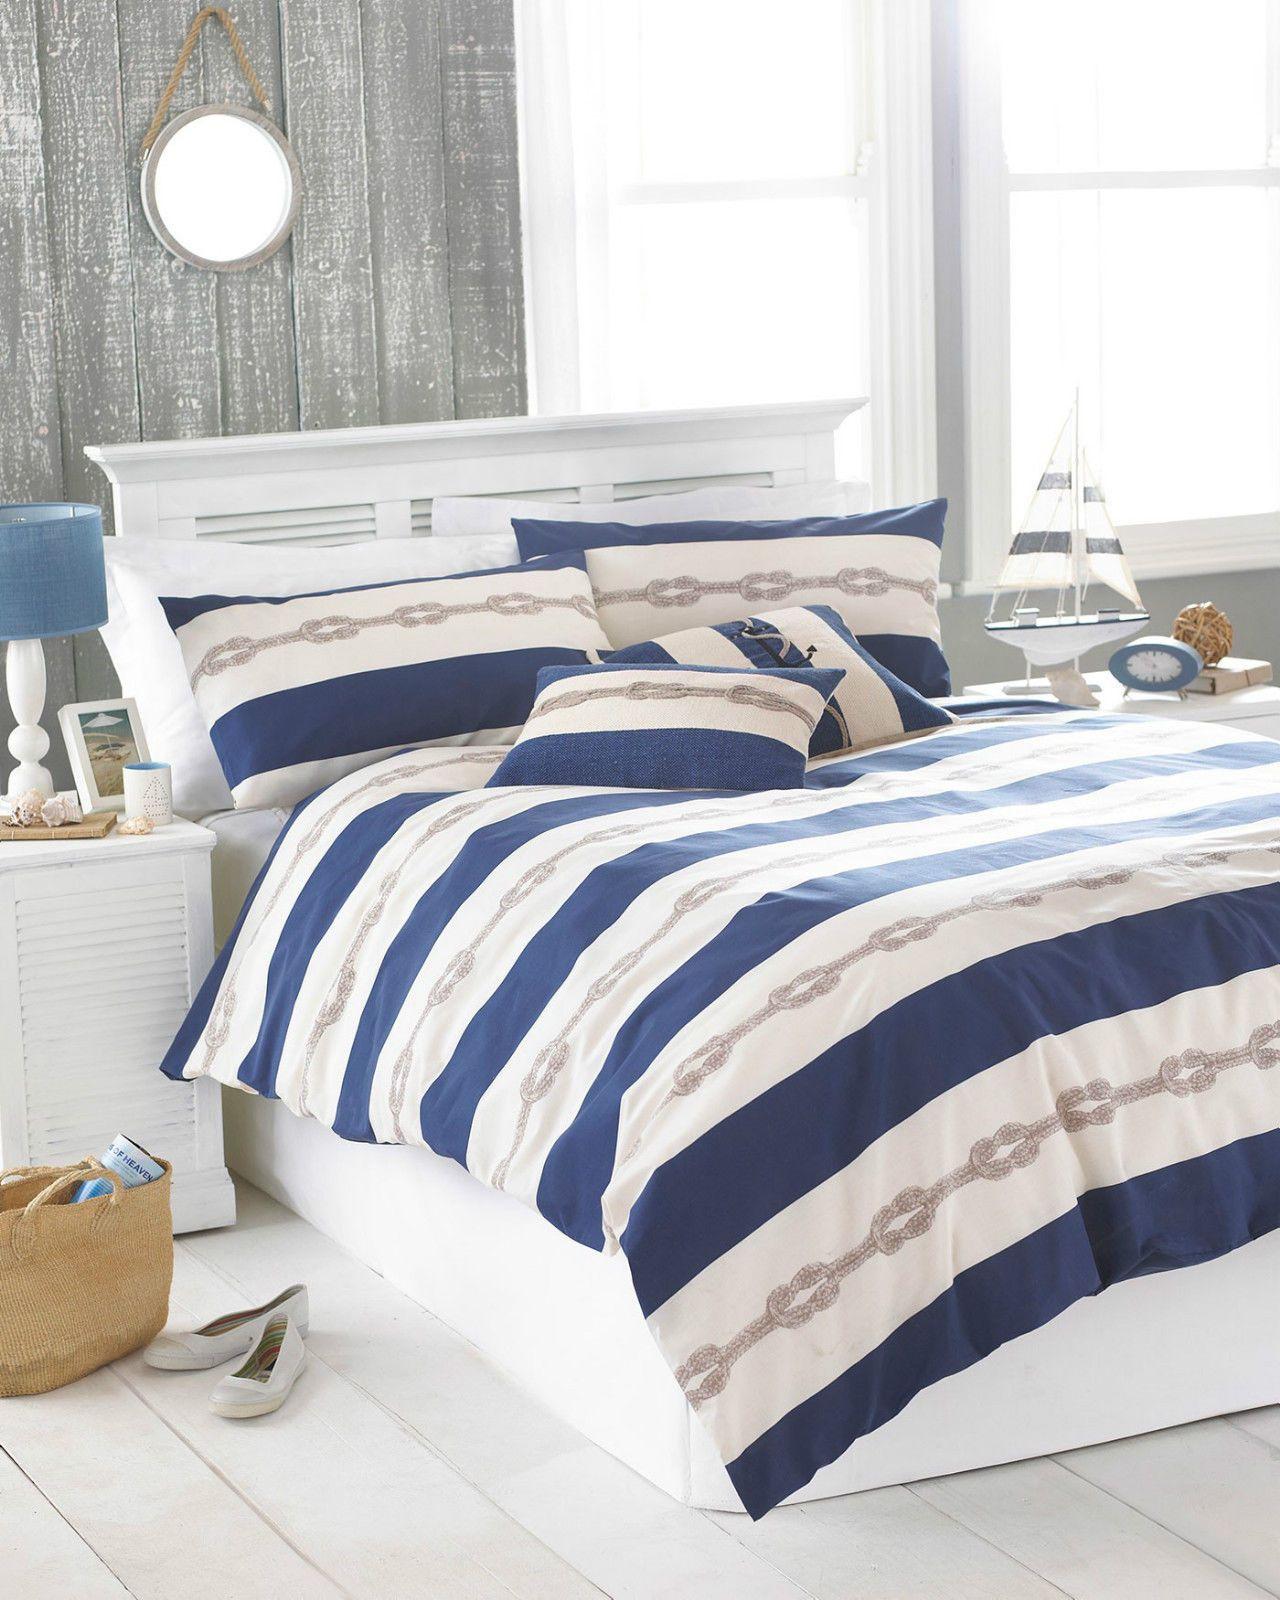 Nautical Theme Striped Duvet Cove Set Navy Blue & Beige